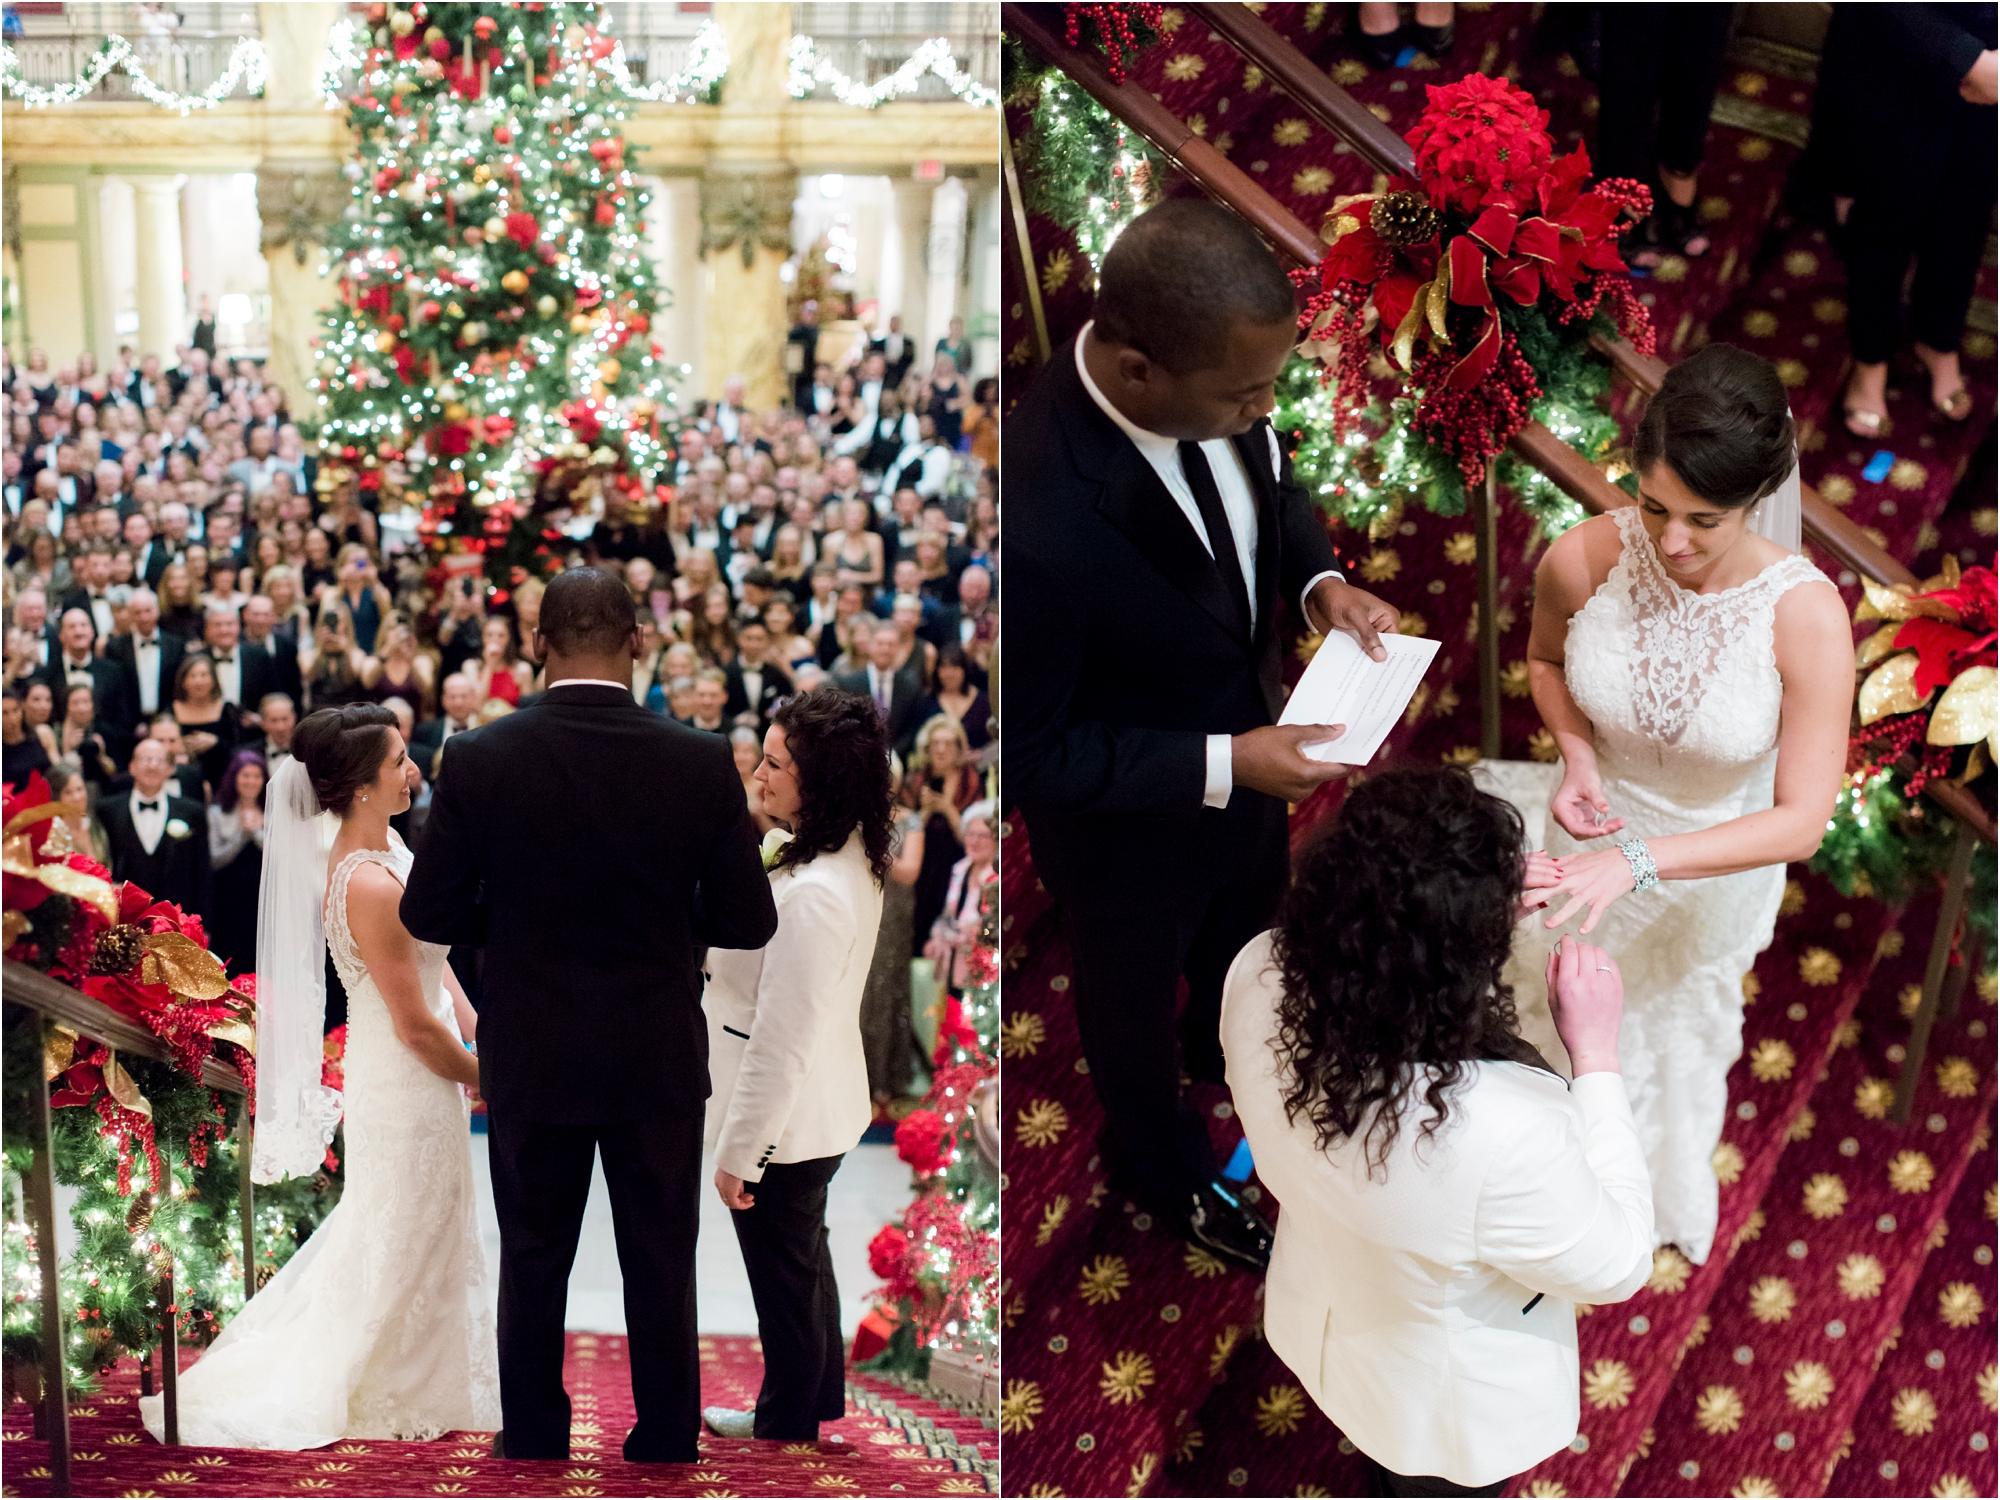 phoebe-mayme-richmond-virginia-colorful-love-is-love-wedding-photos_0022.jpg